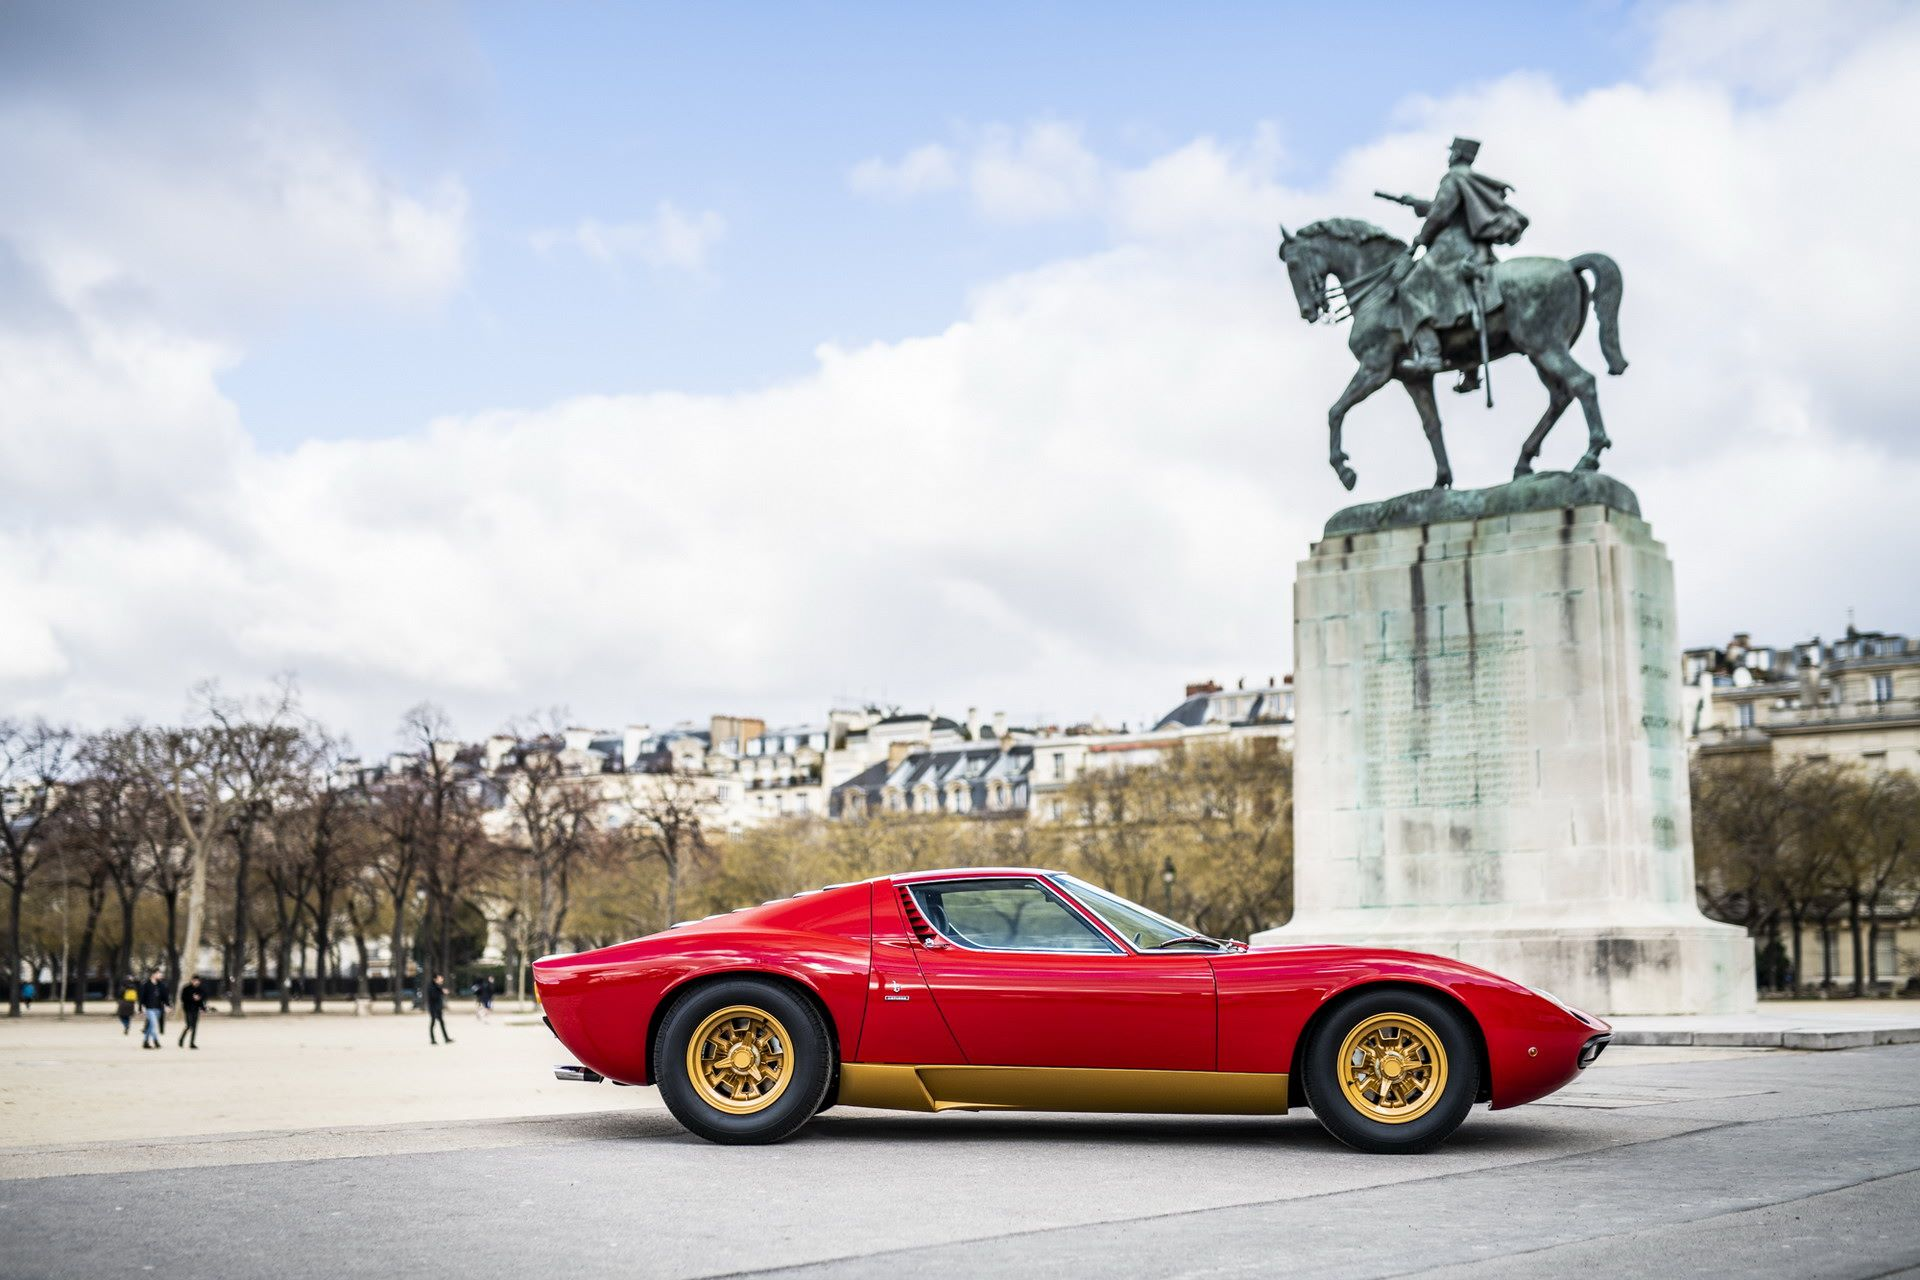 Lamborghini-Miura-SV-turns-50-14